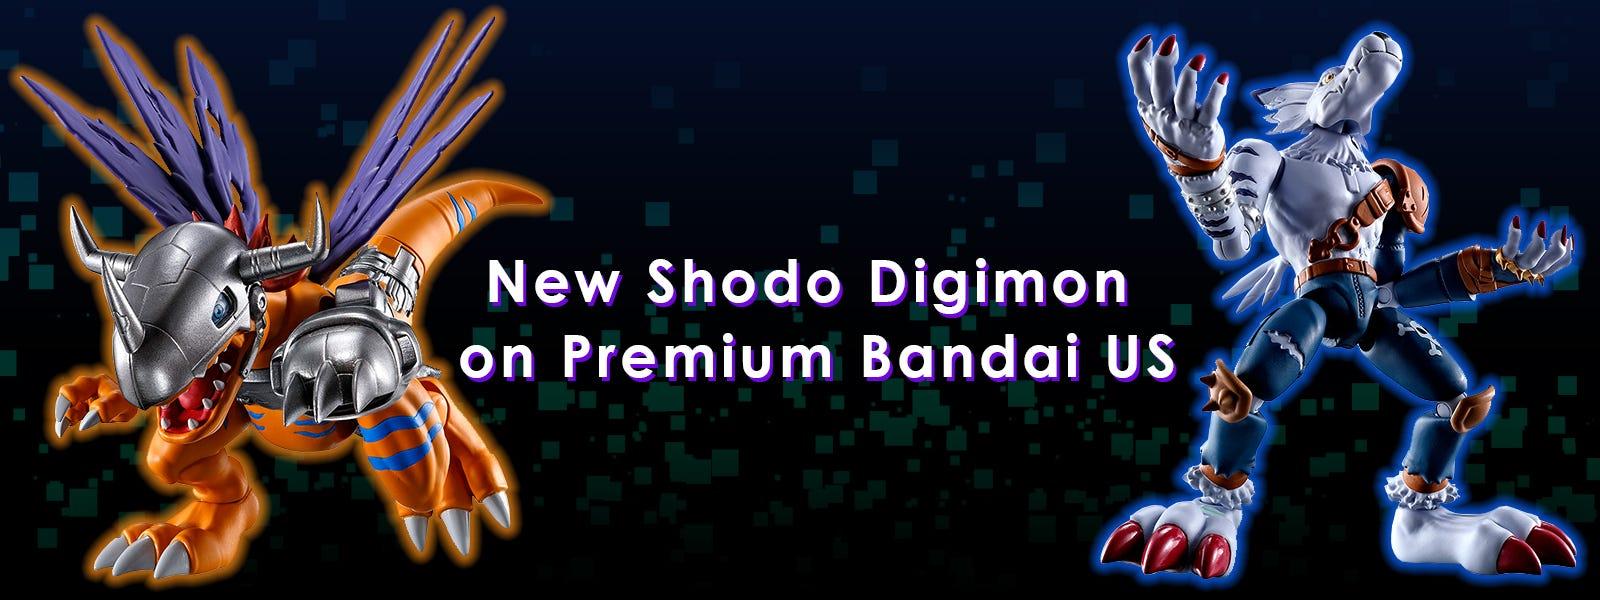 New Shodo Digimon on Premium Bandai US